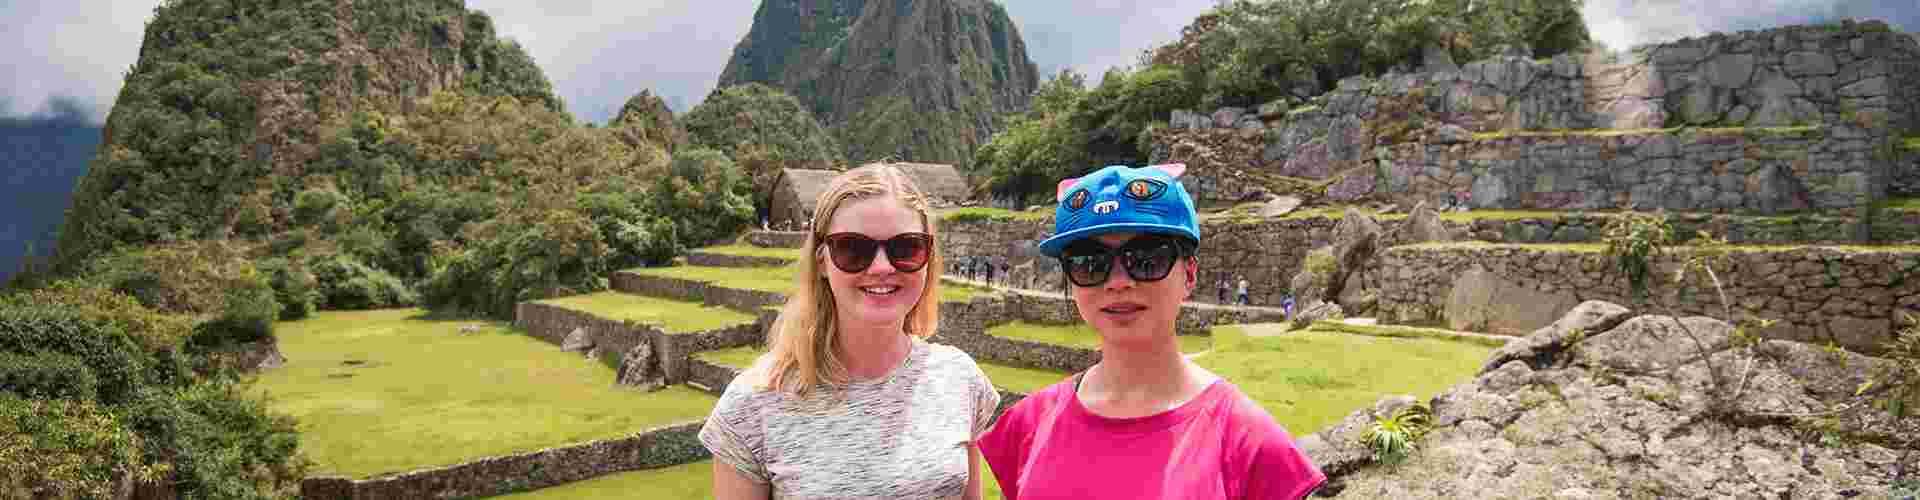 Intrepid Travel Peru Reviews